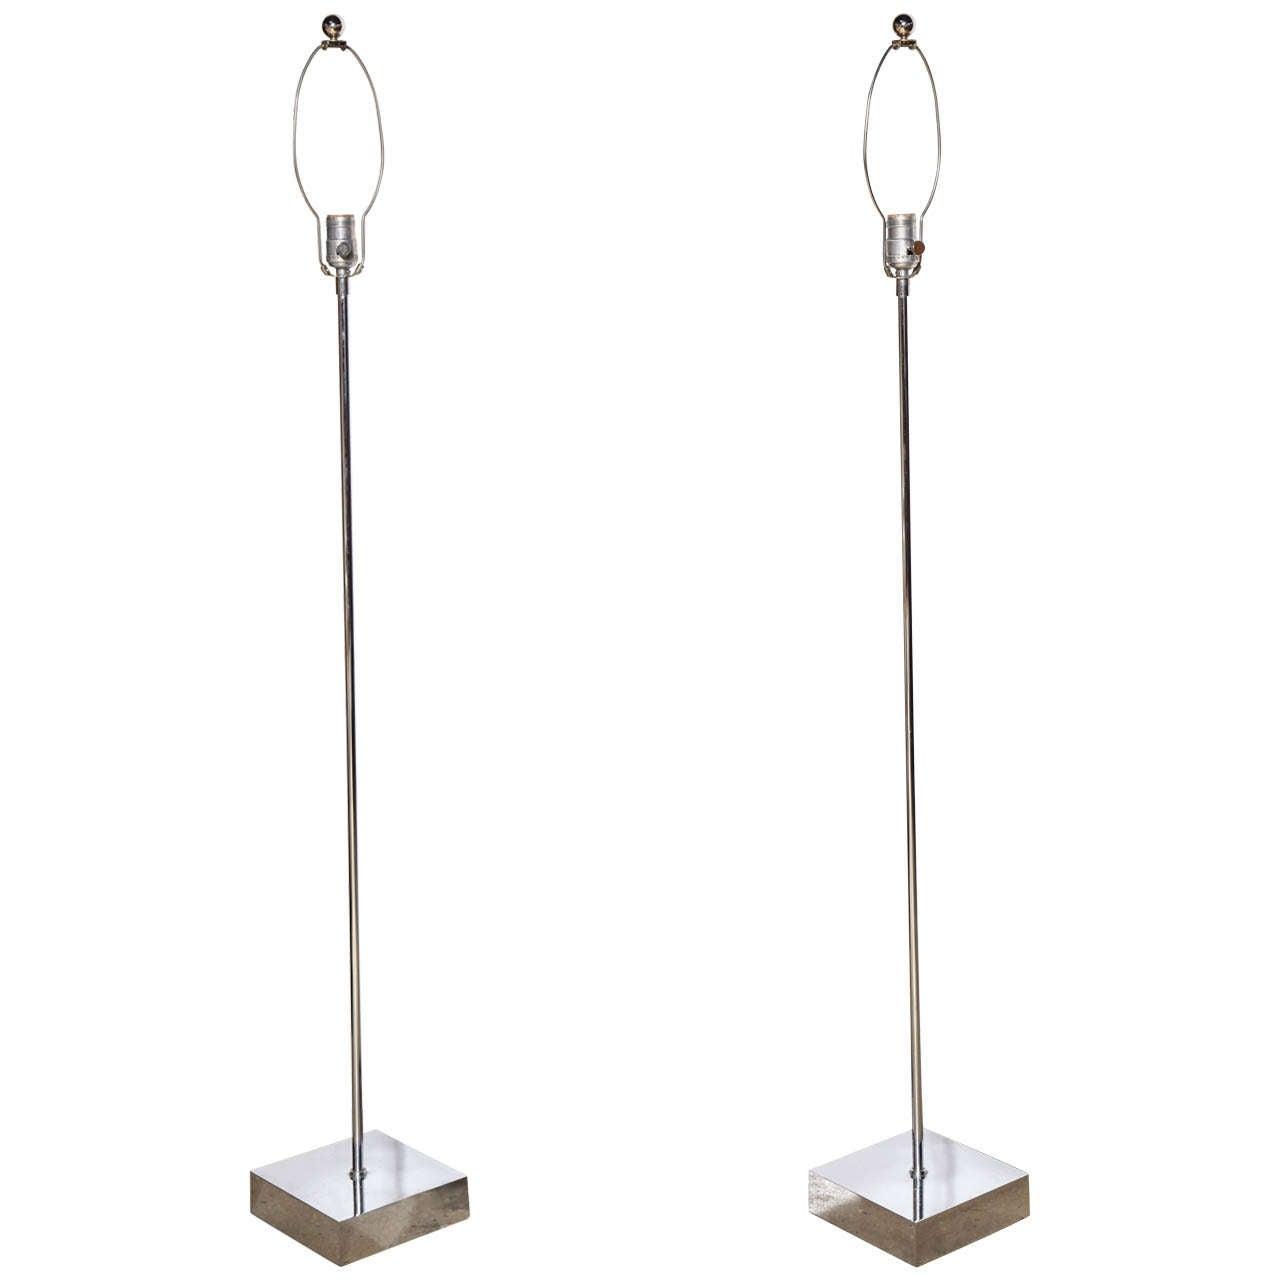 Pair of 196039s quothabitatquot chrome floor lamps at 1stdibs for Habitat chrome floor lamp